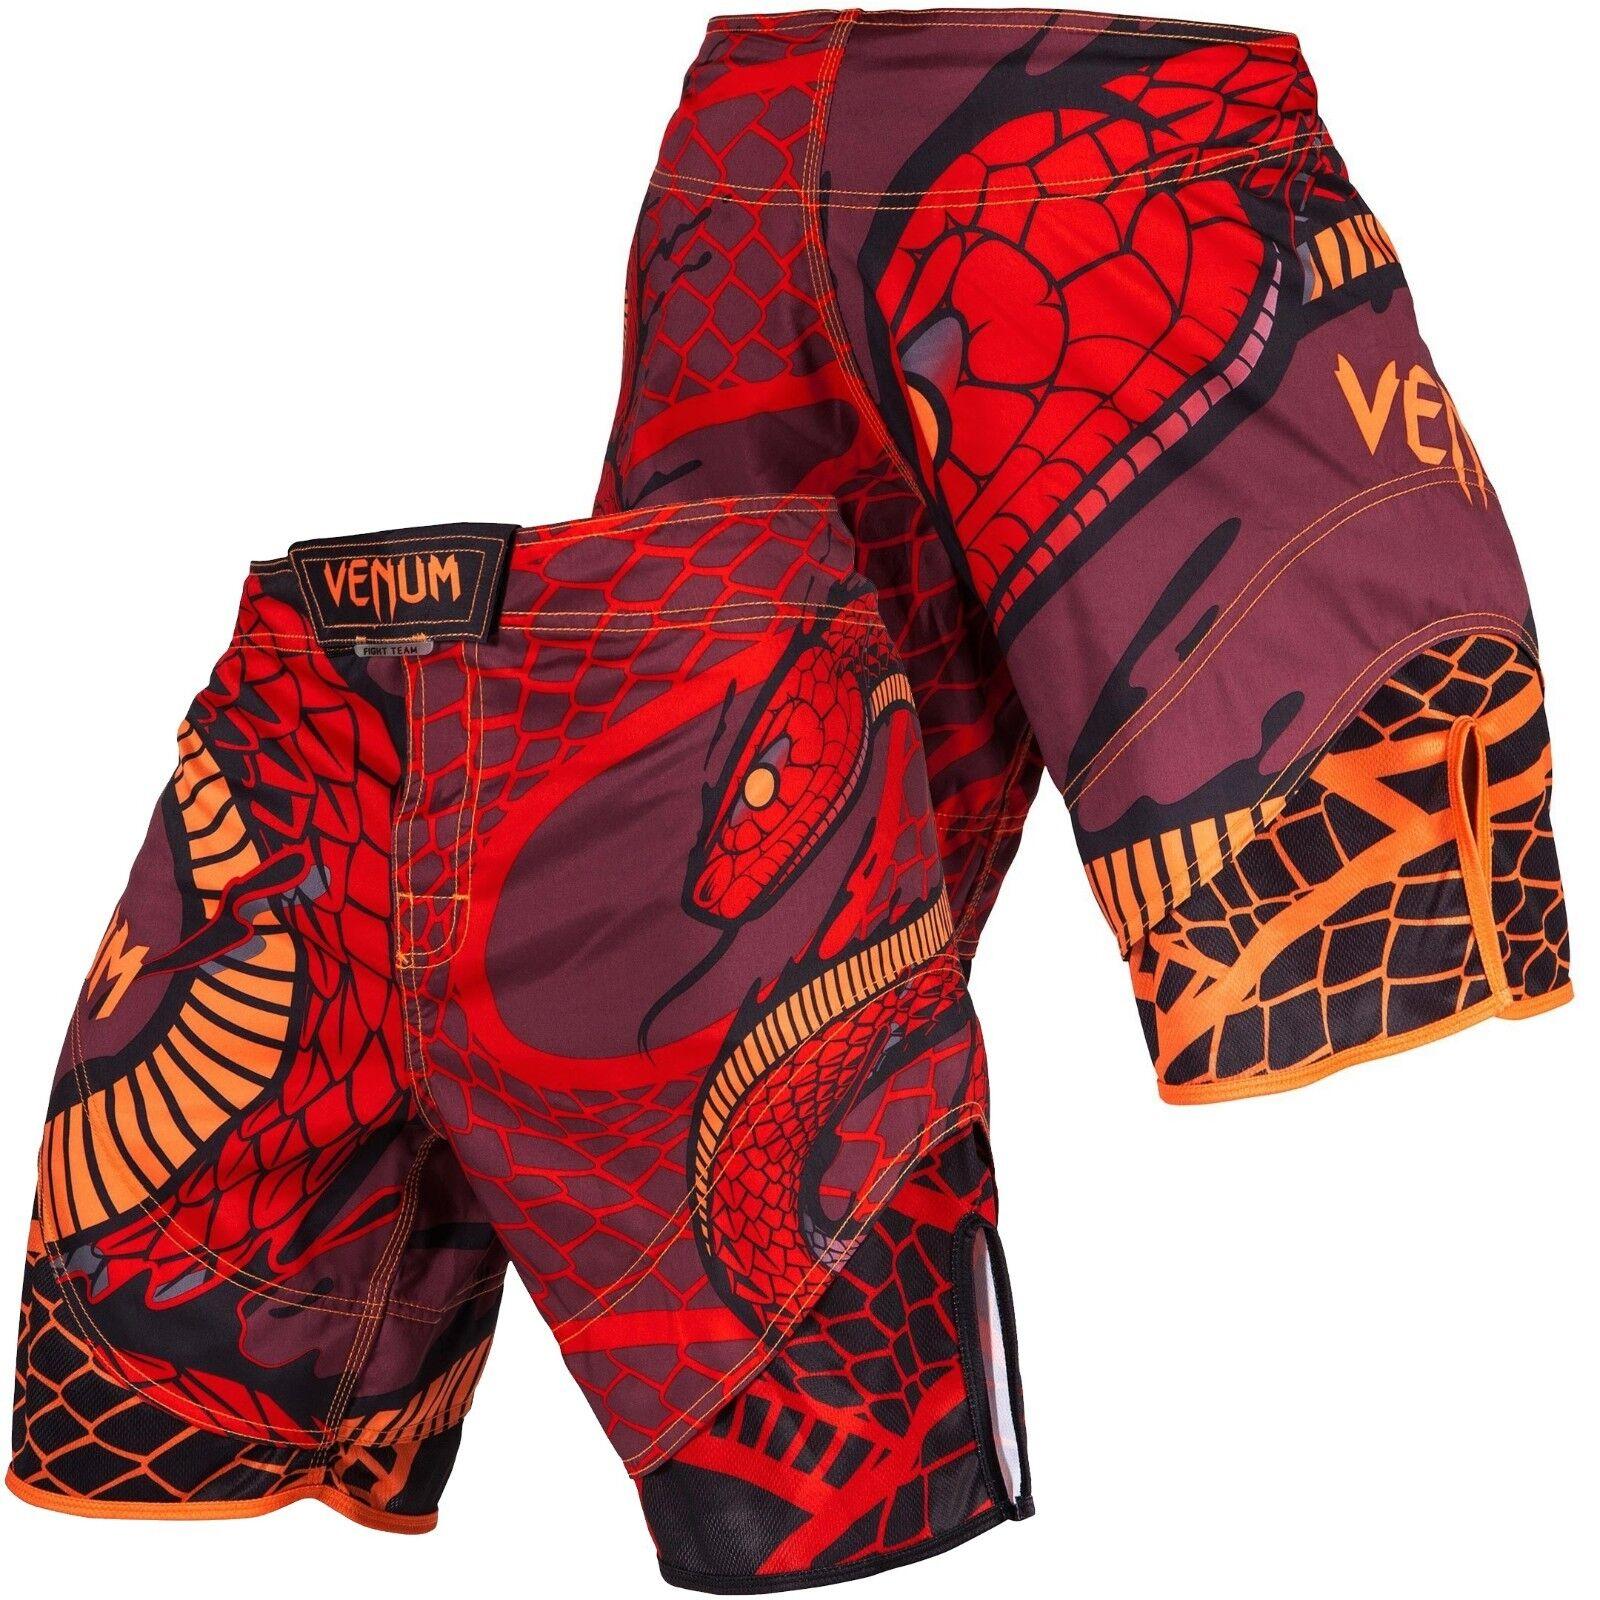 Venum Uomo Snaker Pantaloncini Lotta Mma Rosso,Wrestling,Bjj ,Jiu-Jitsu,Surf,